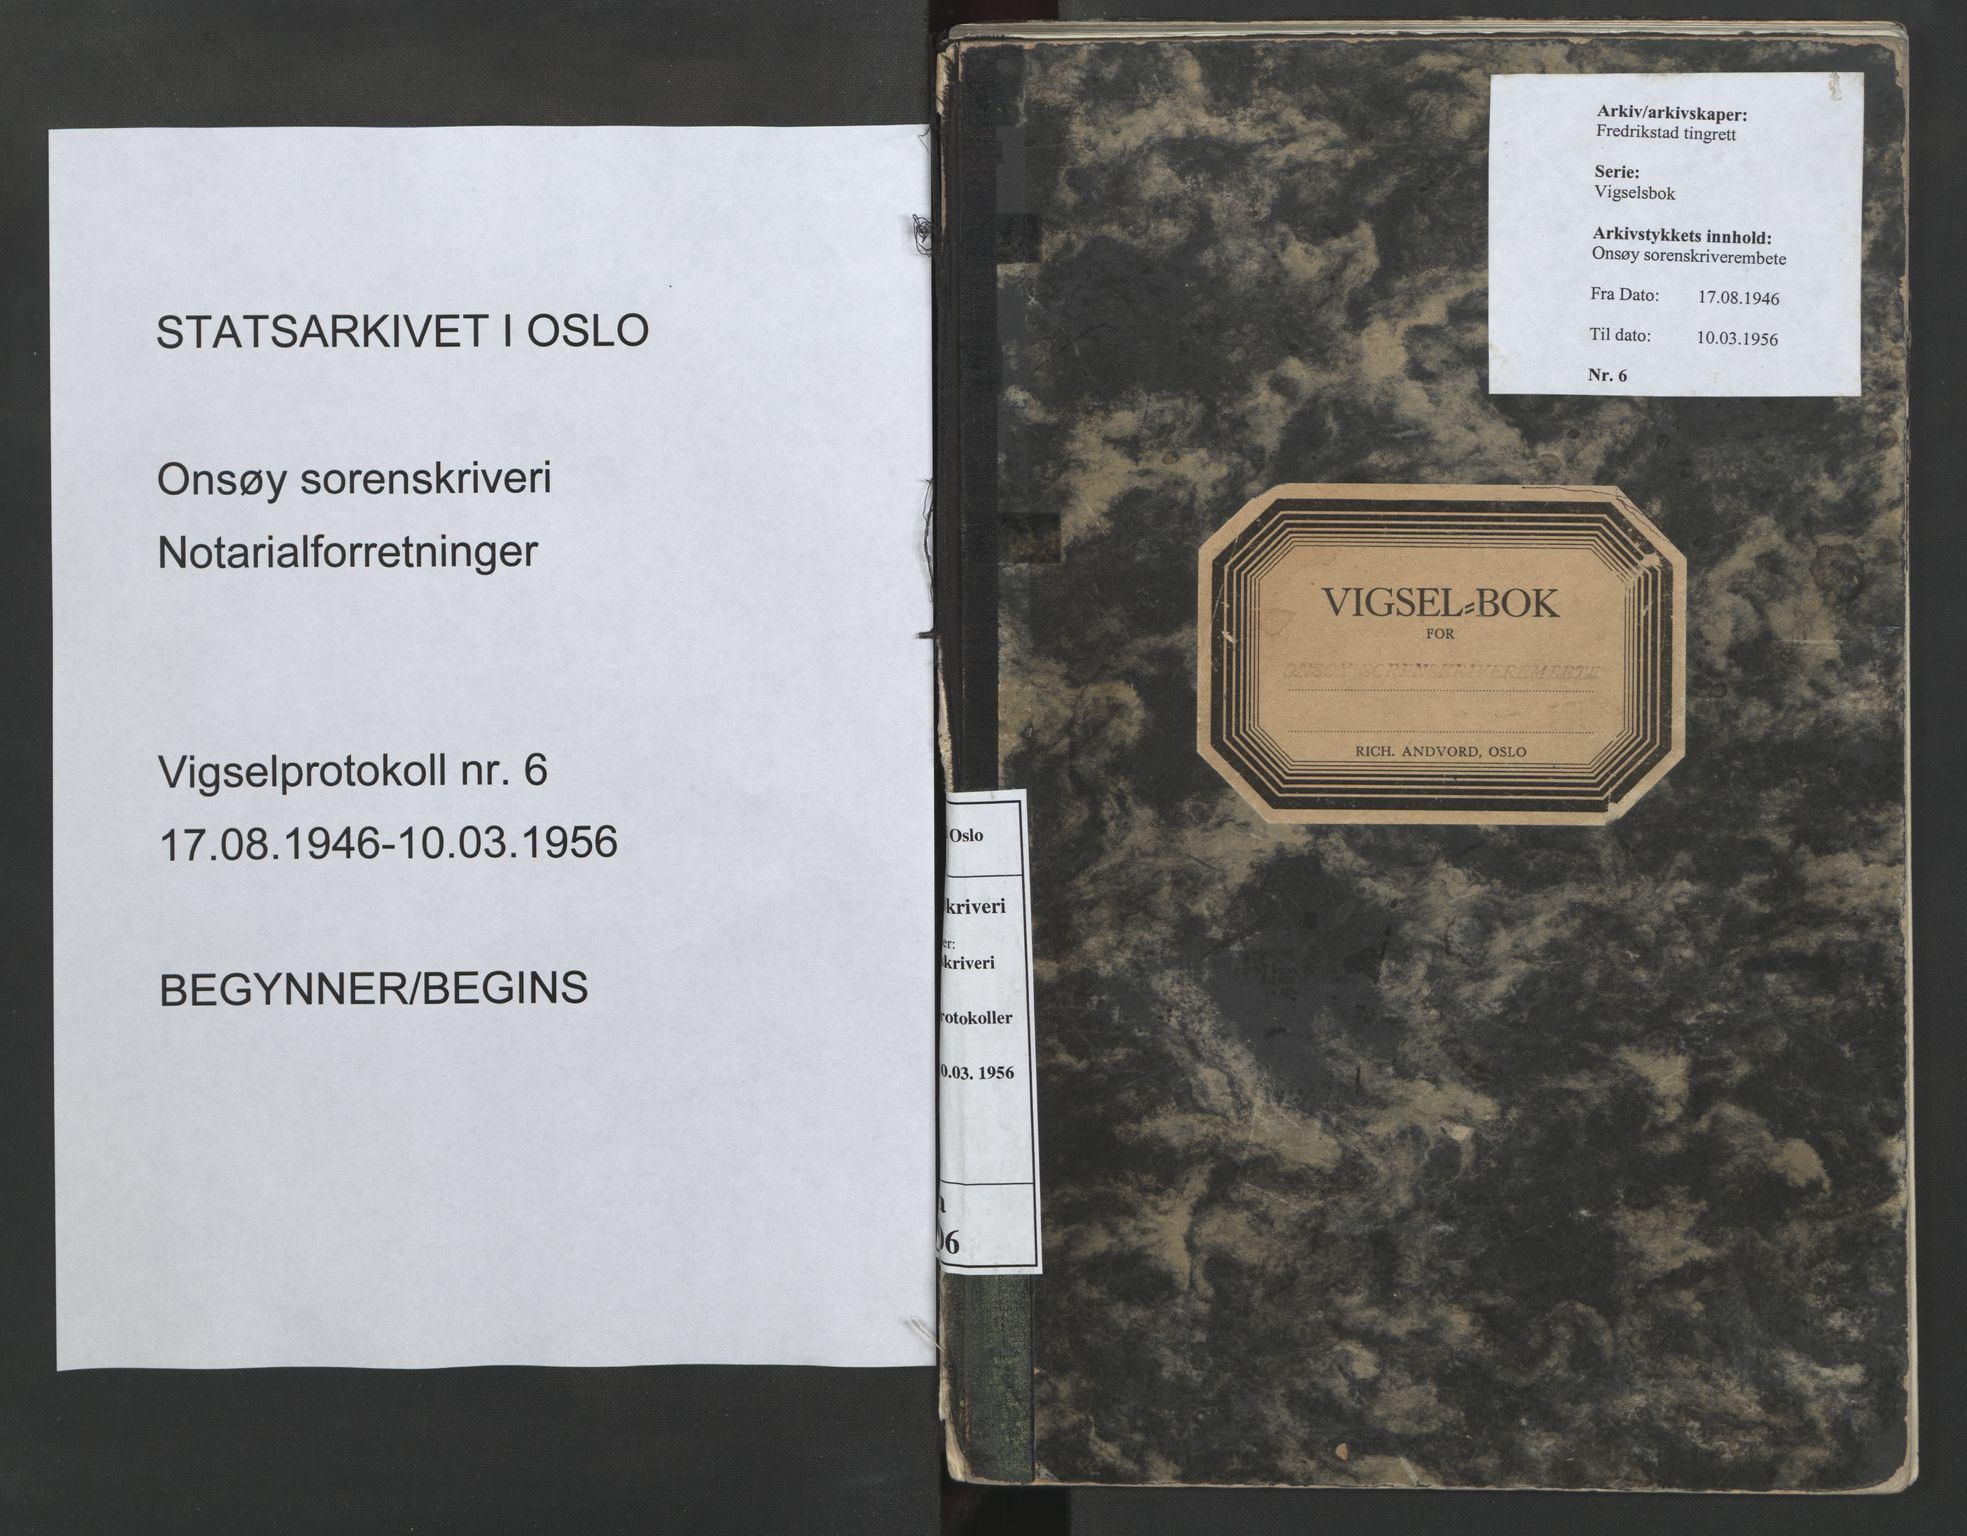 SAO, Onsøy sorenskriveri, L/La/L0006: Vigselsbok, 1946-1956, s. upaginert